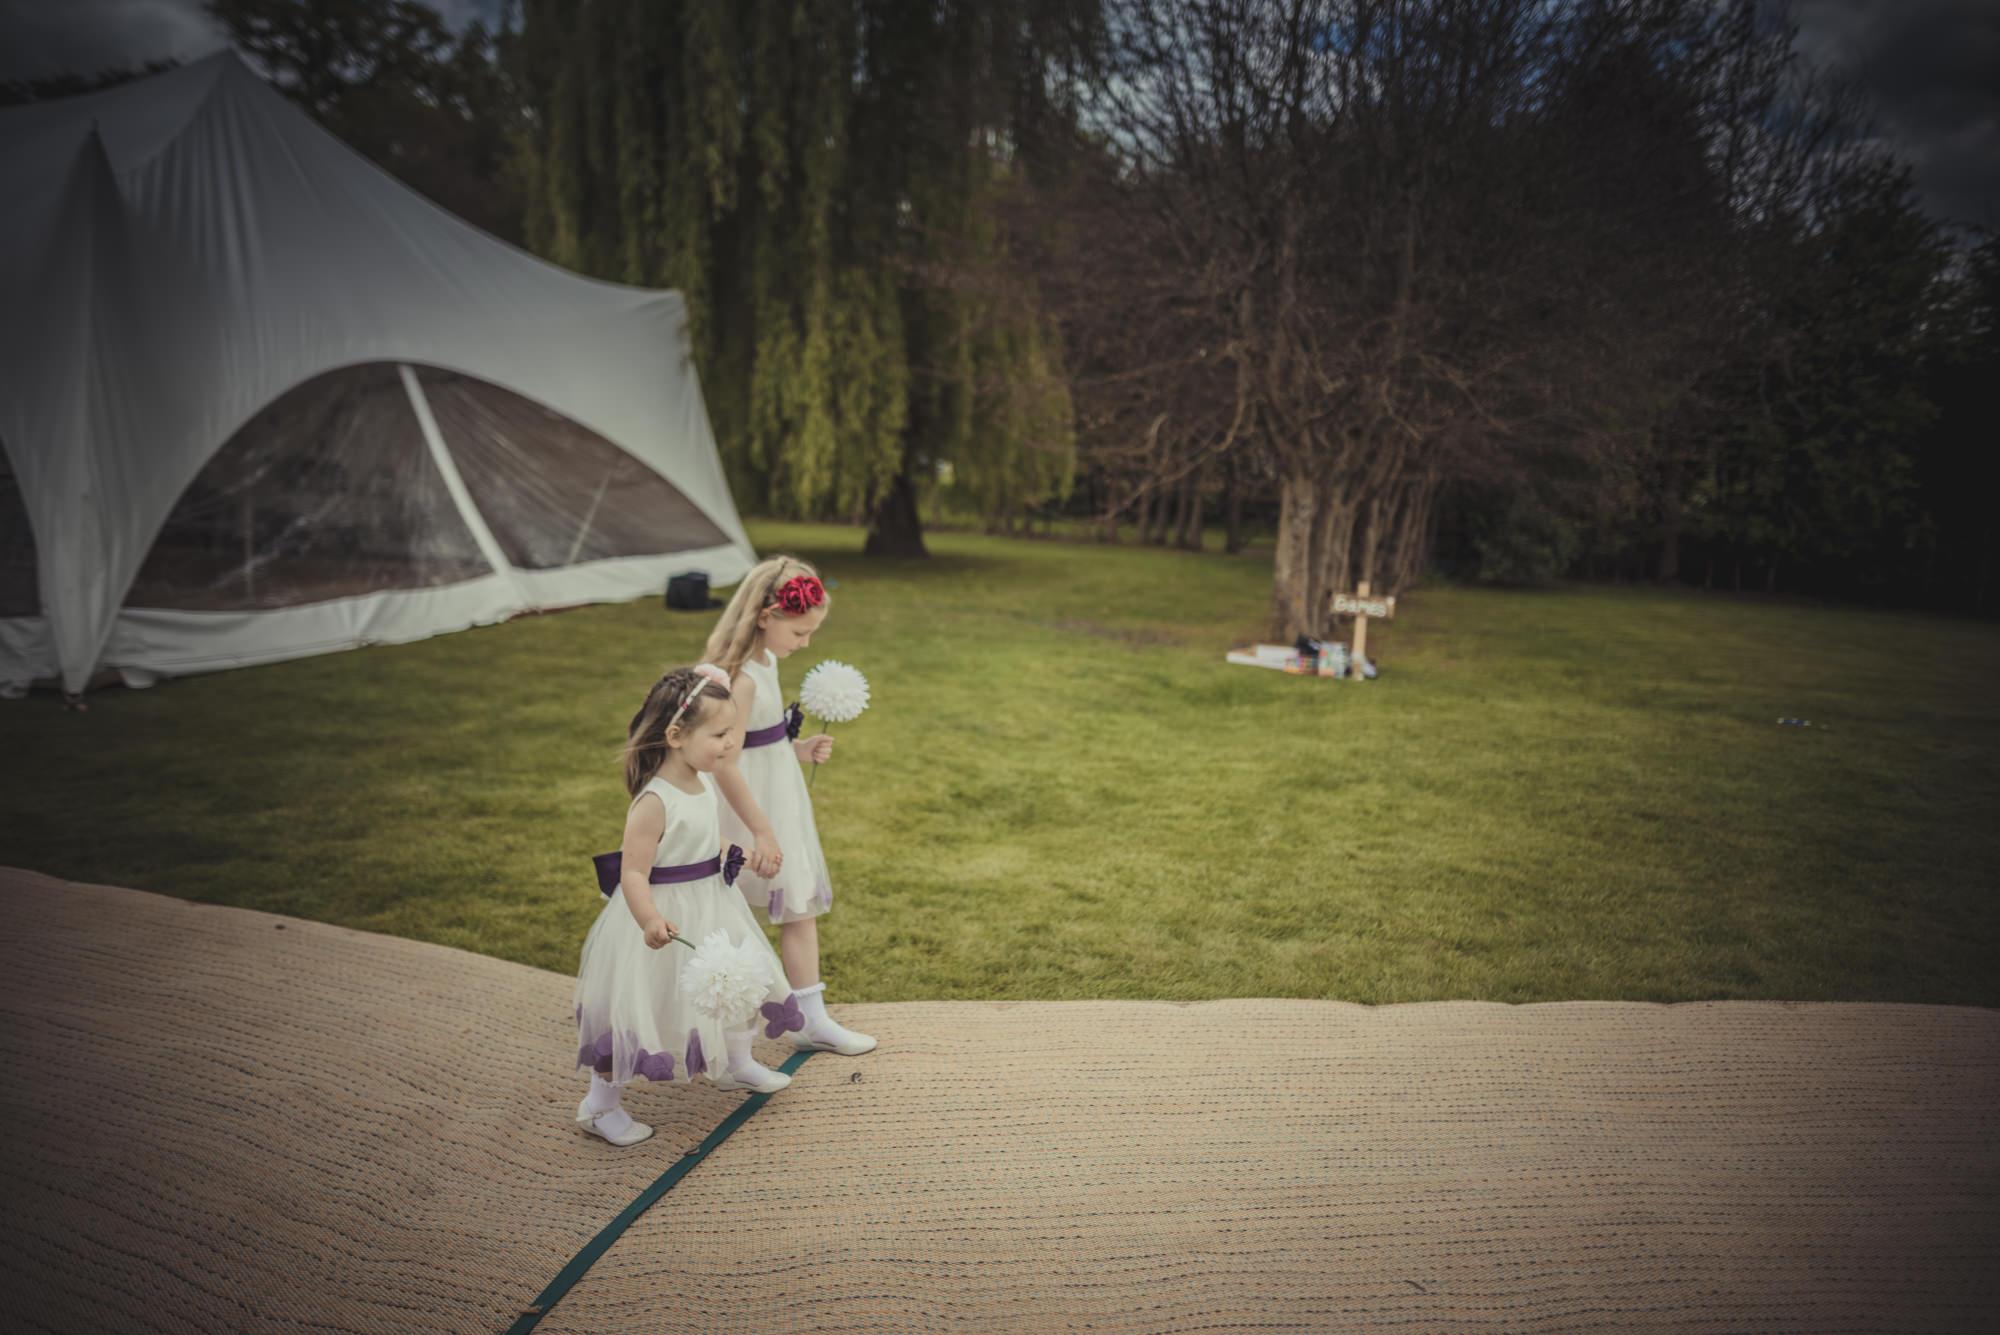 Jacqueline-Gareth-Wedding-Westmead-Events-Surrey-Manu-Mendoza-Wedding-Photography-176.jpg